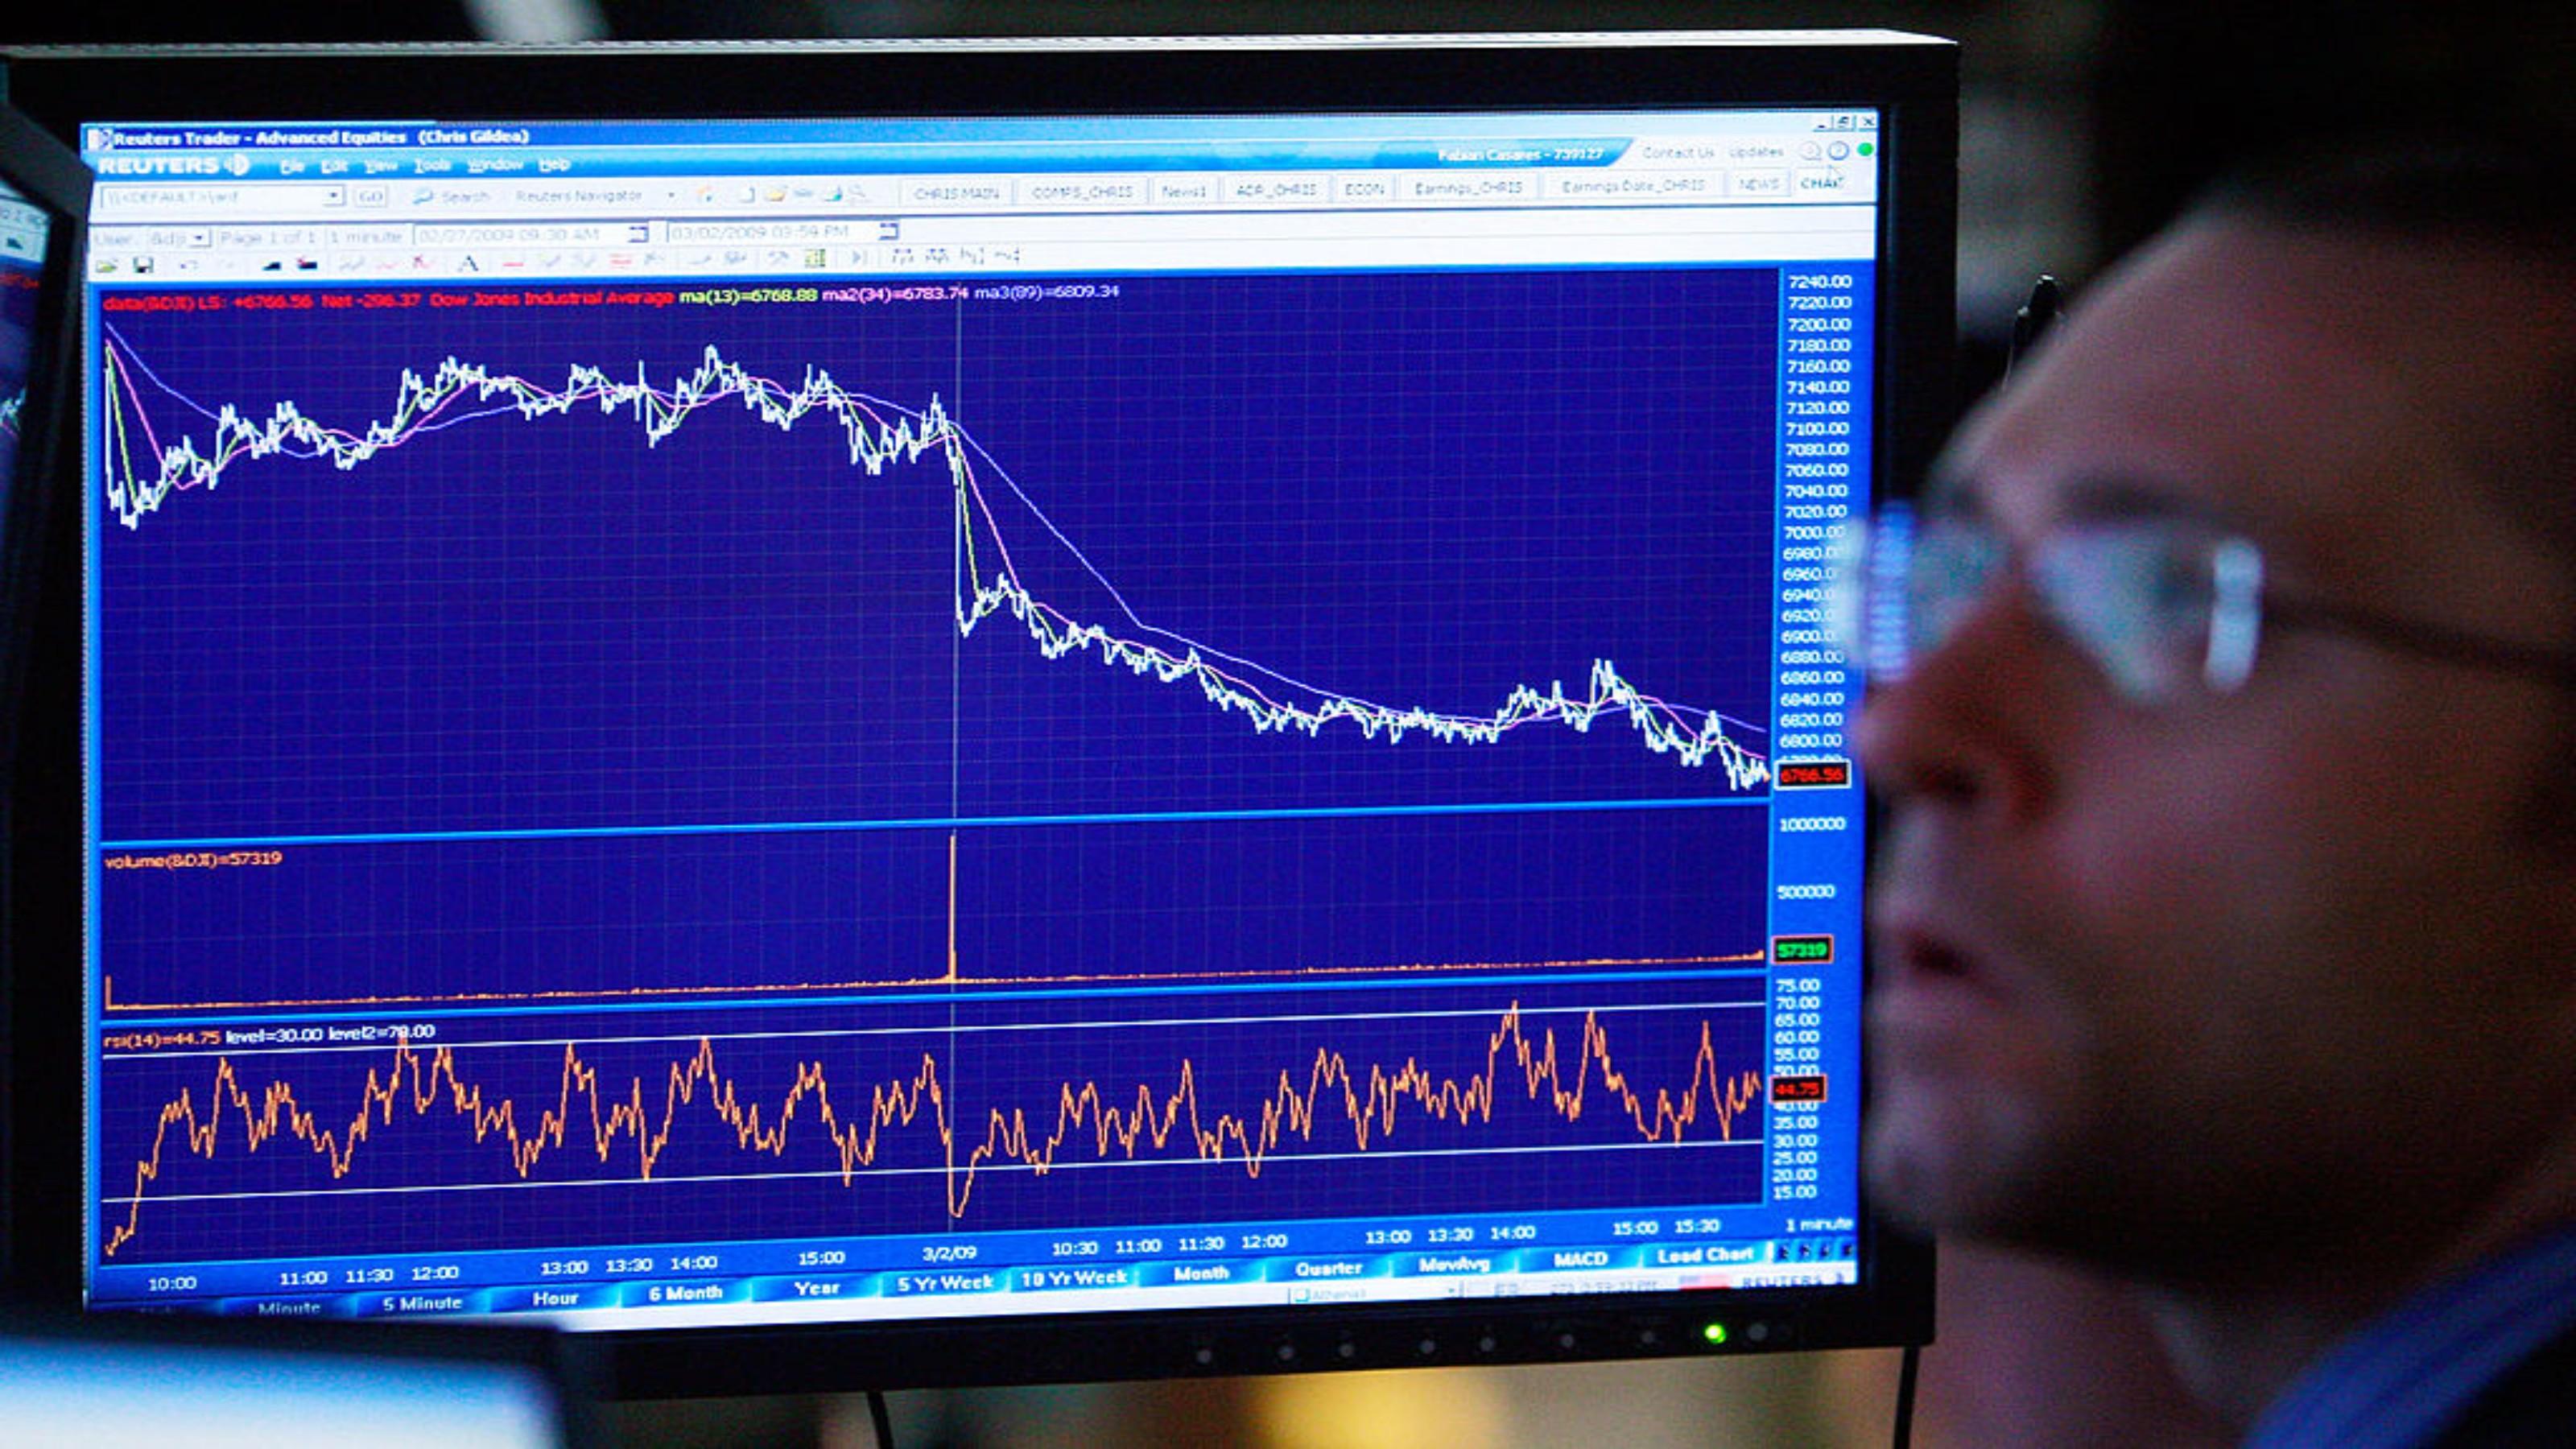 Stock Market Today: Stocks Step Back Amid Economic Gloom   Kiplinger